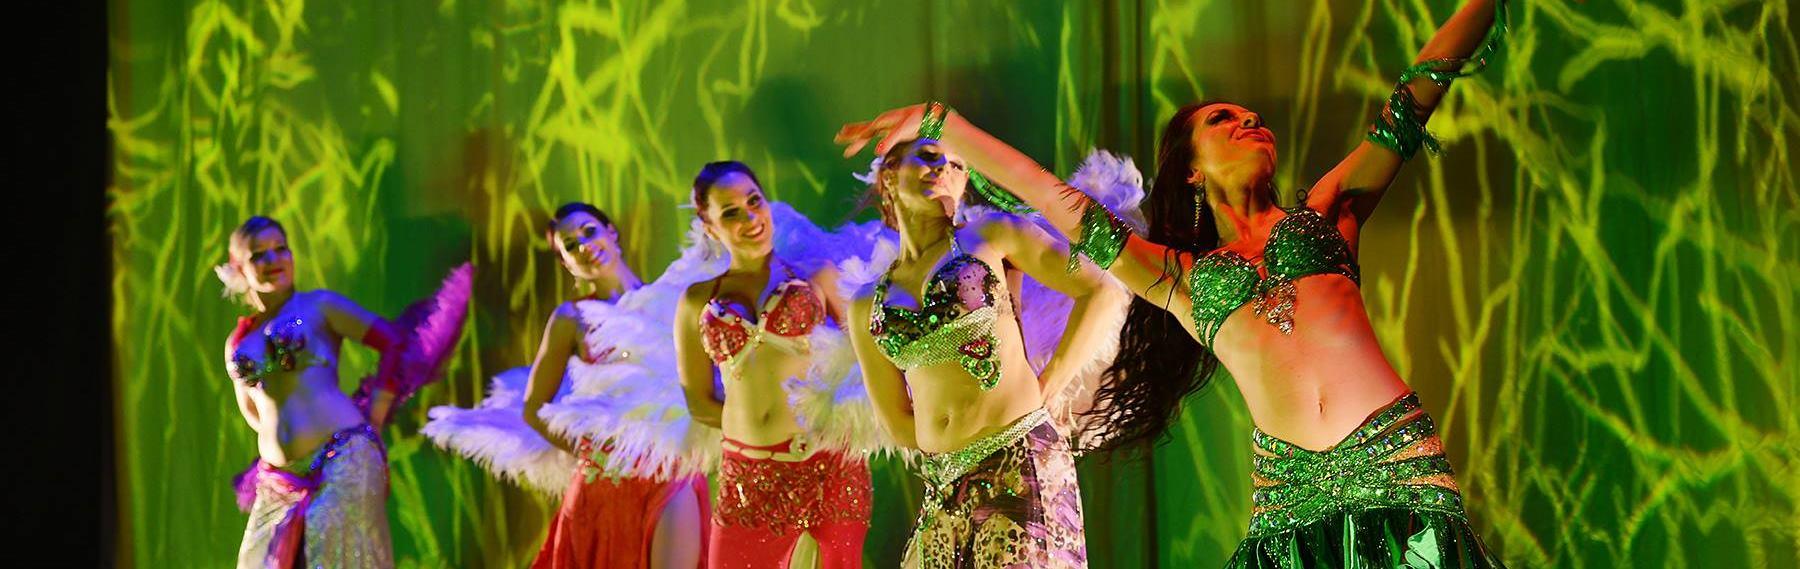 VIDEO: Odmorimo oči uz trbušni ples